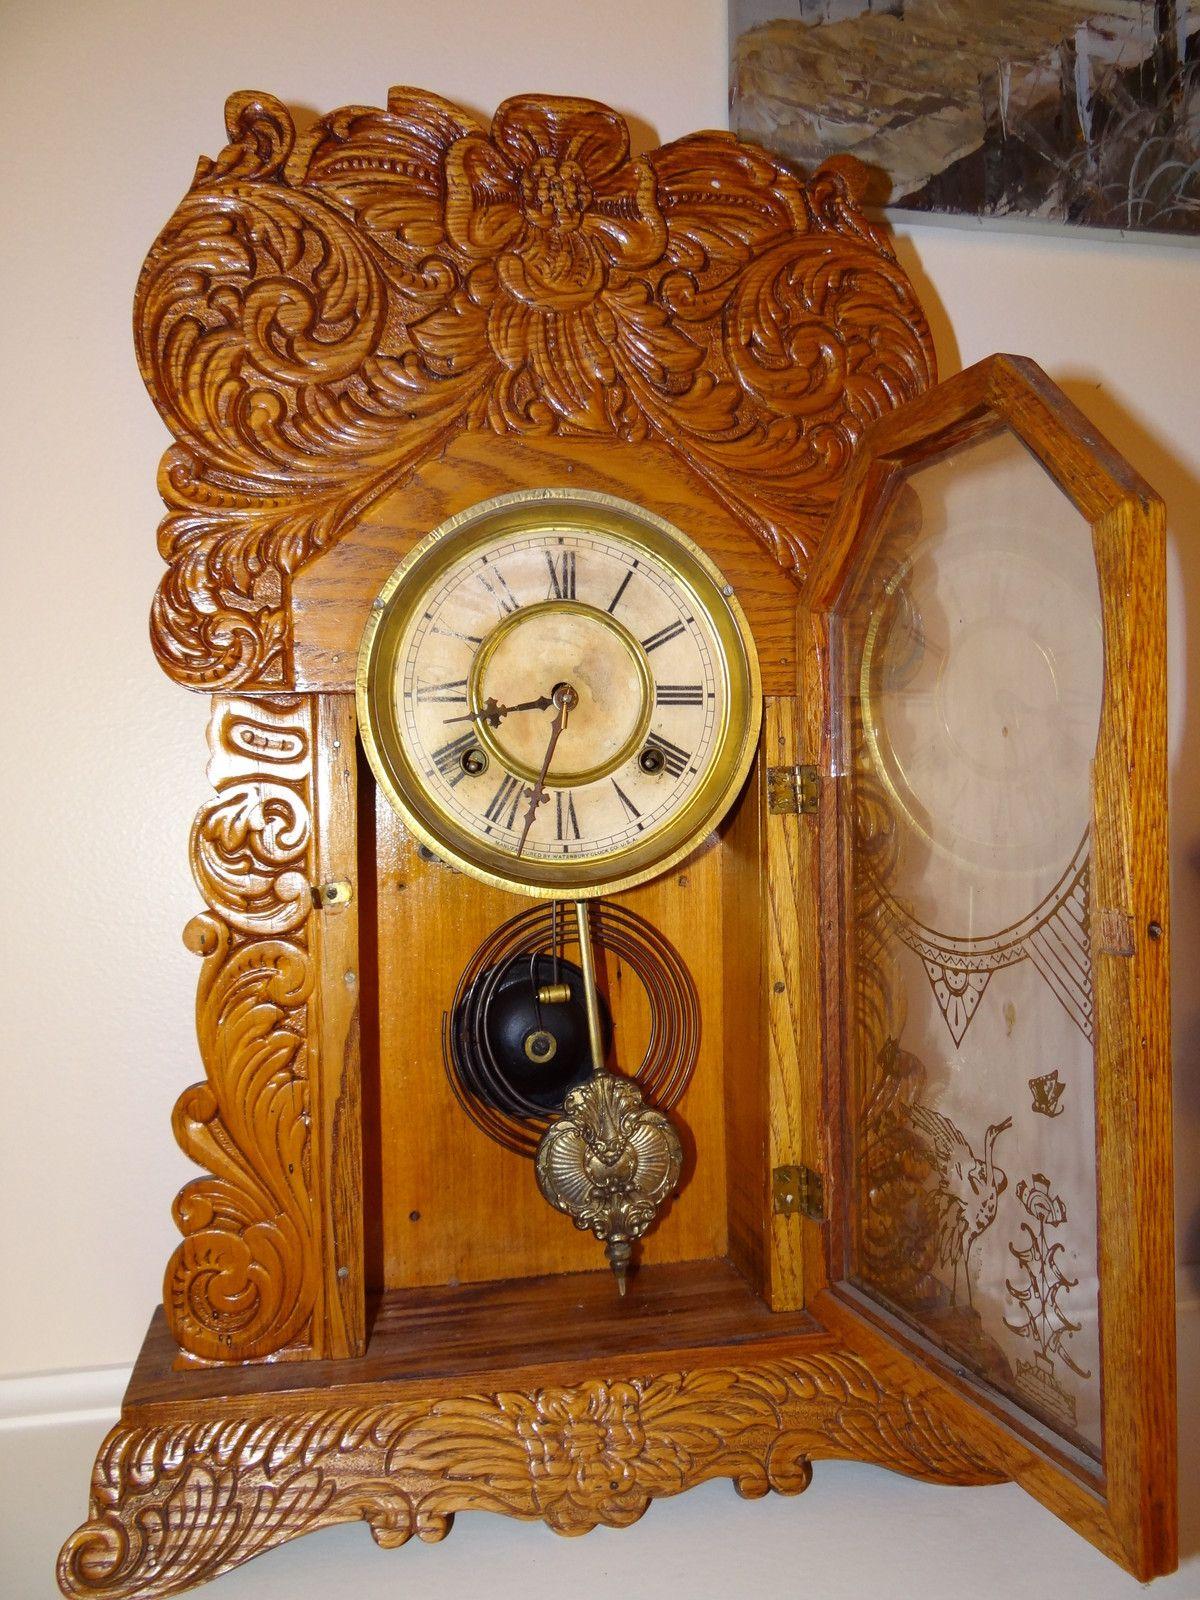 Dating waterbury clocks for sale